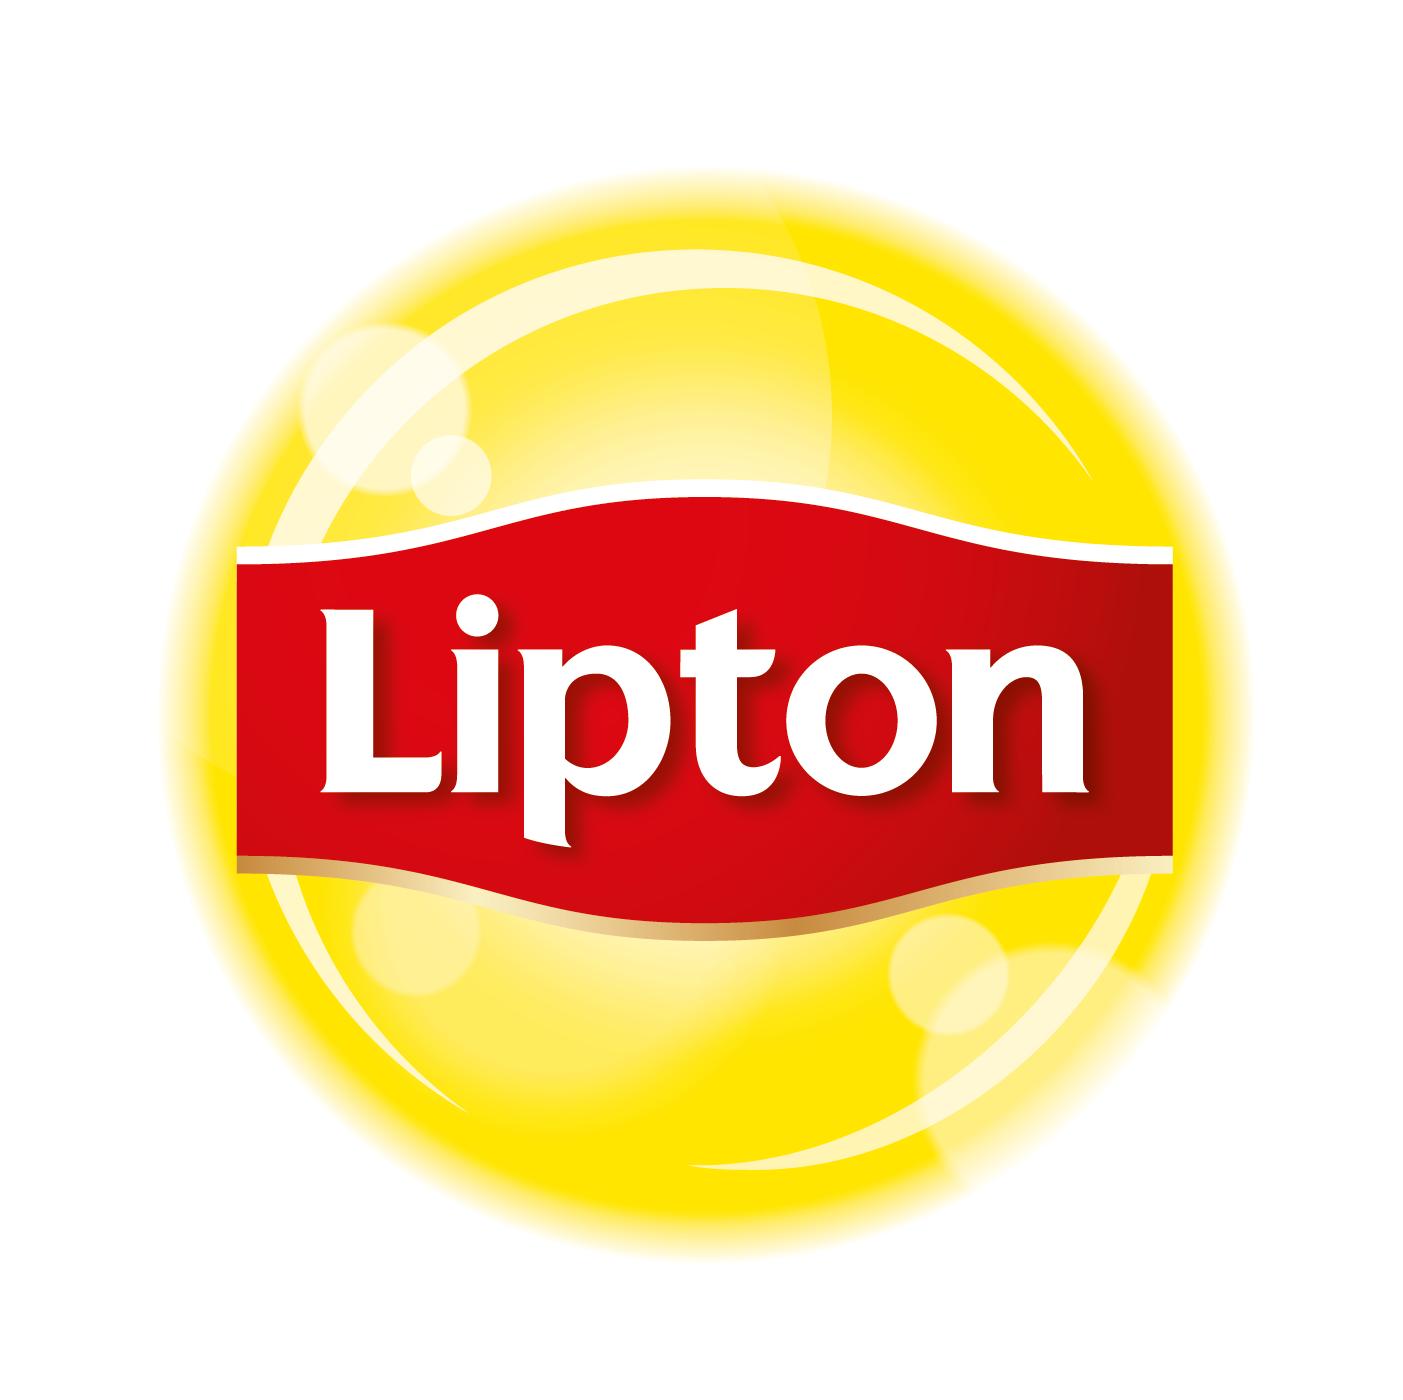 Lipton Bg